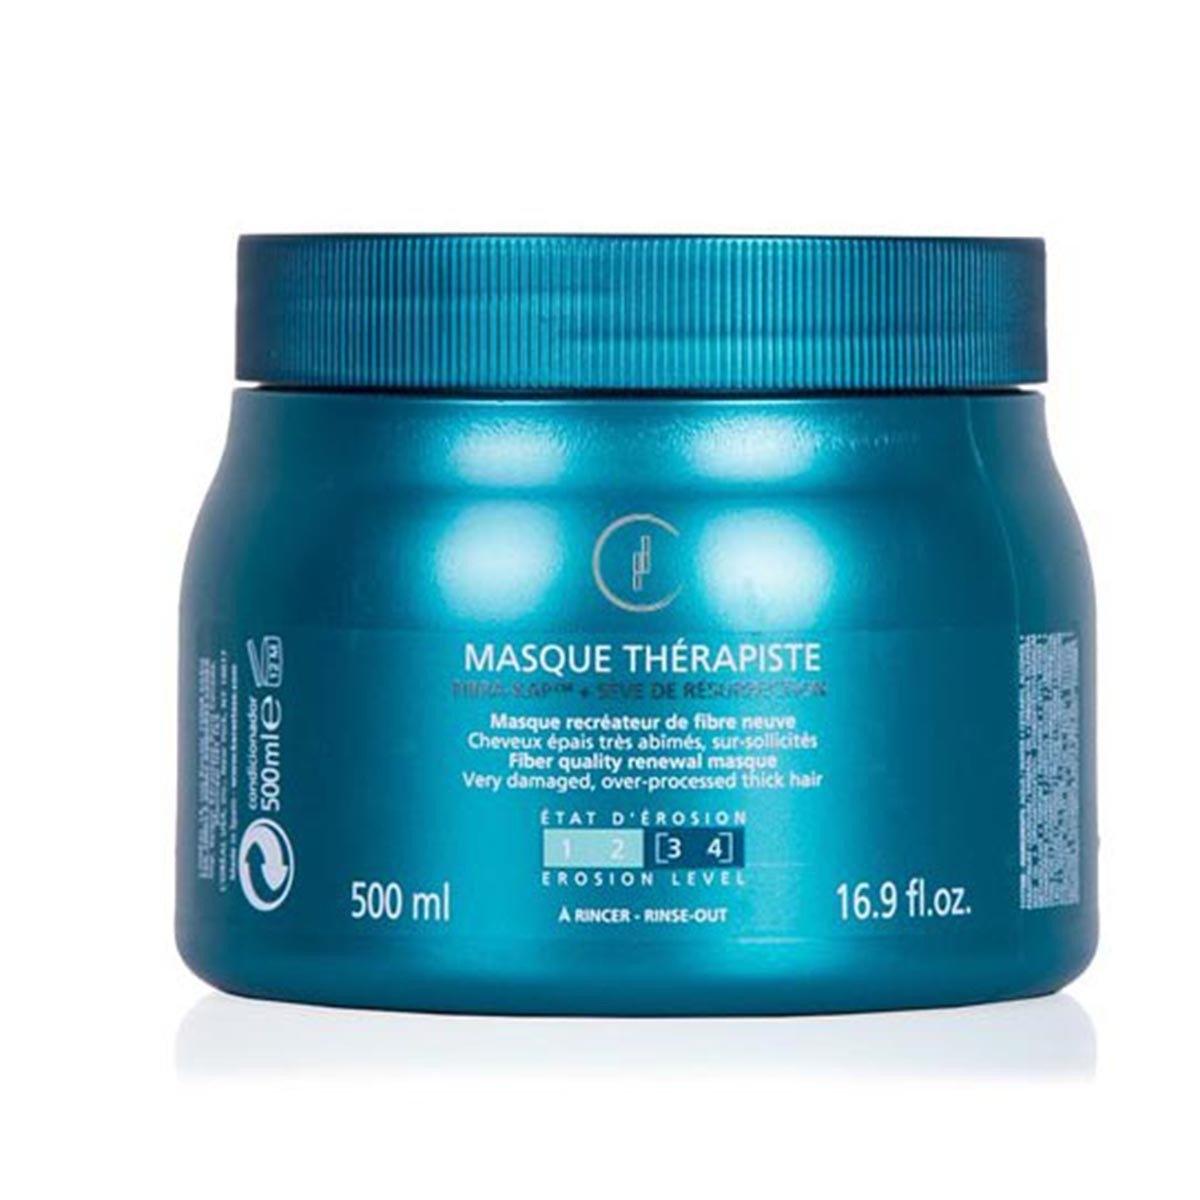 Masque Therapiste 500ml